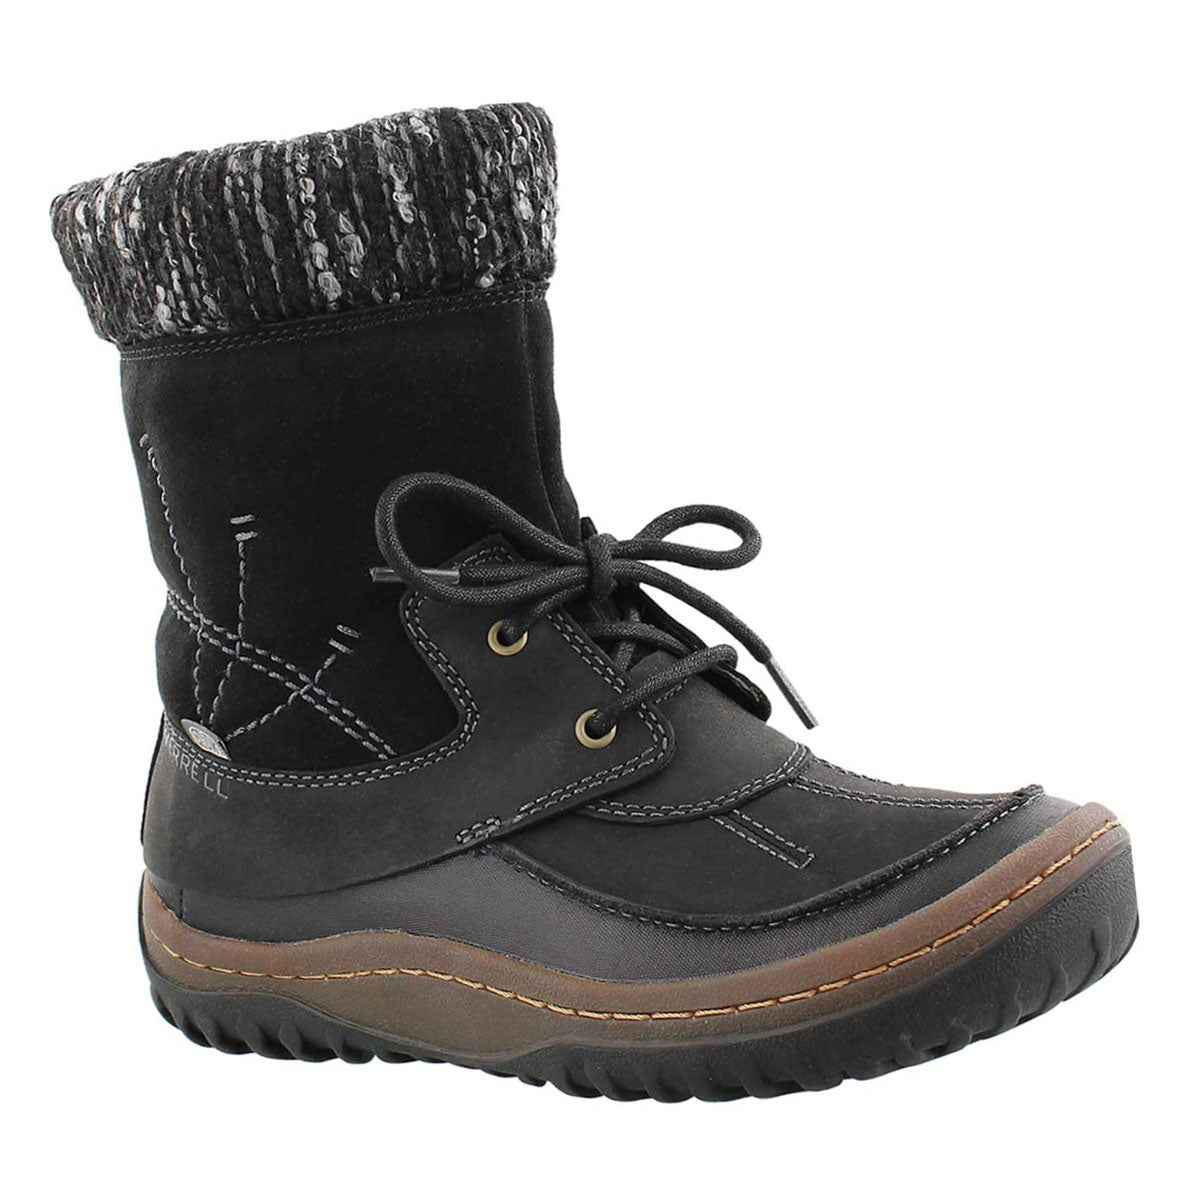 Lds Bolero blk wtrpf winter boot